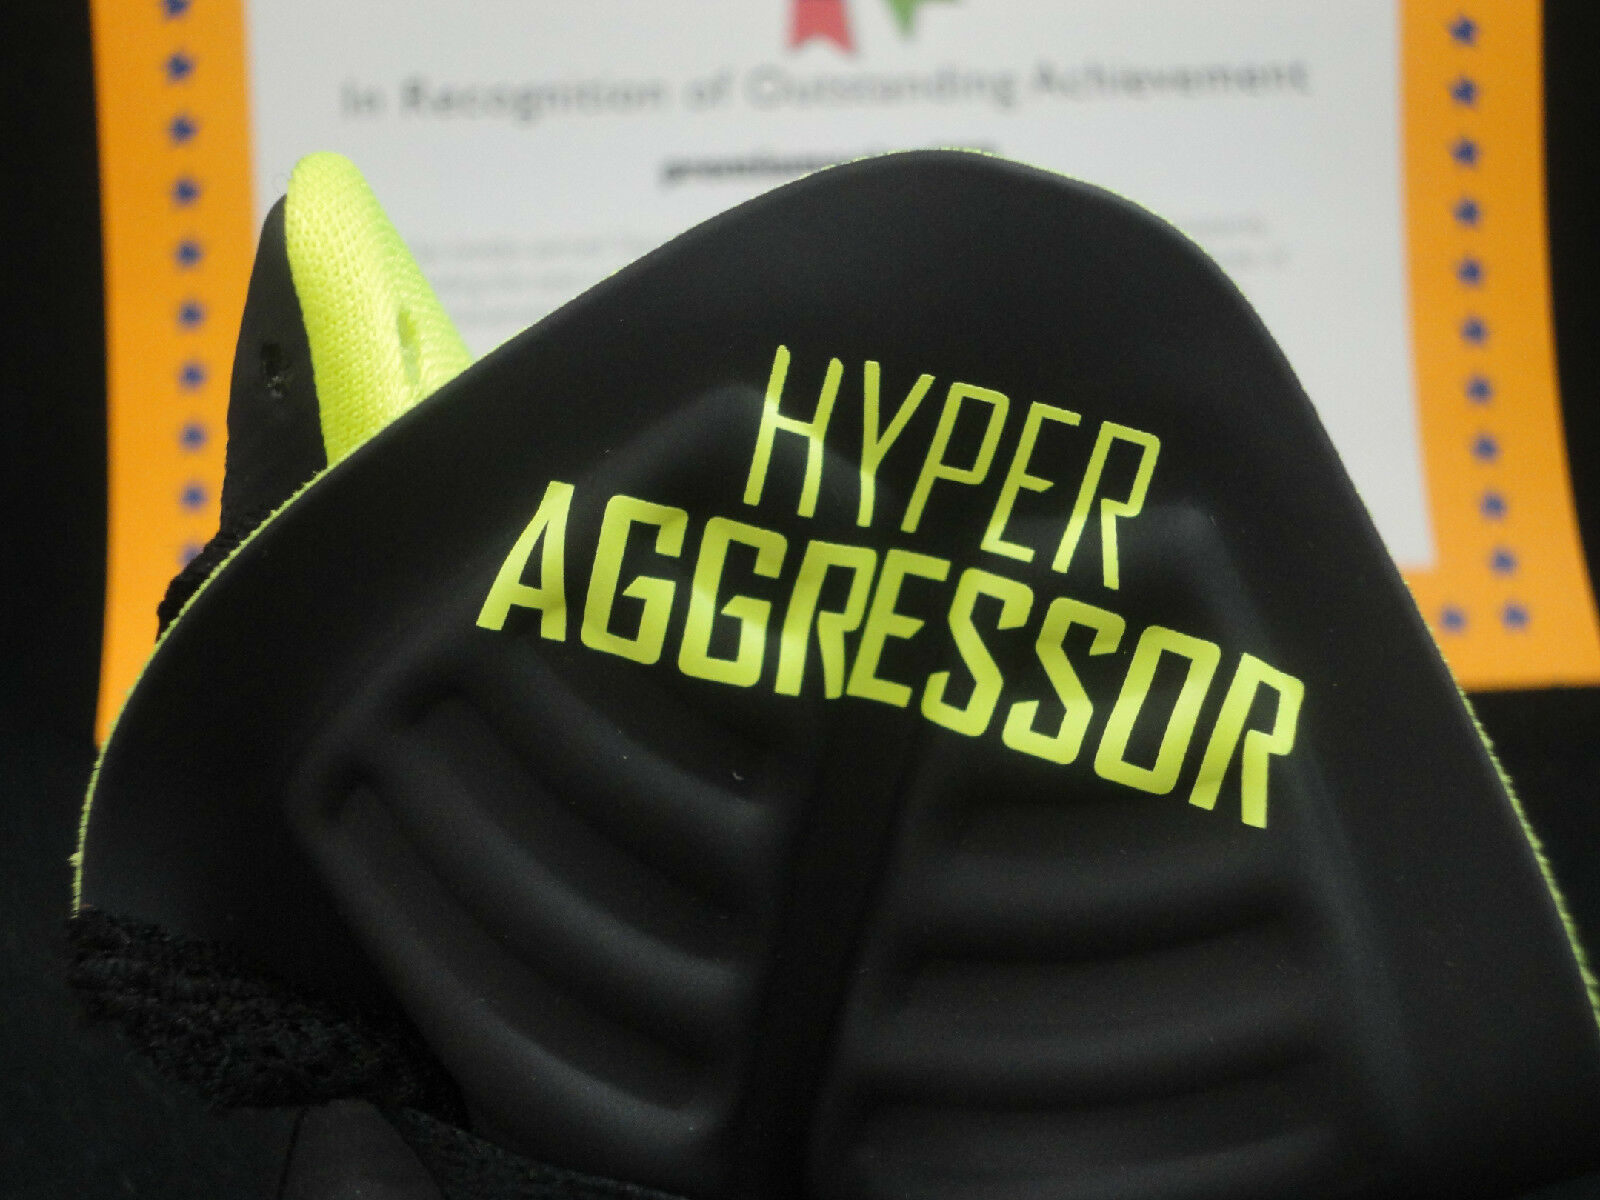 Nike Air Max Hyperaggressor, Svart / Volt, 2012, Storlek 11.5